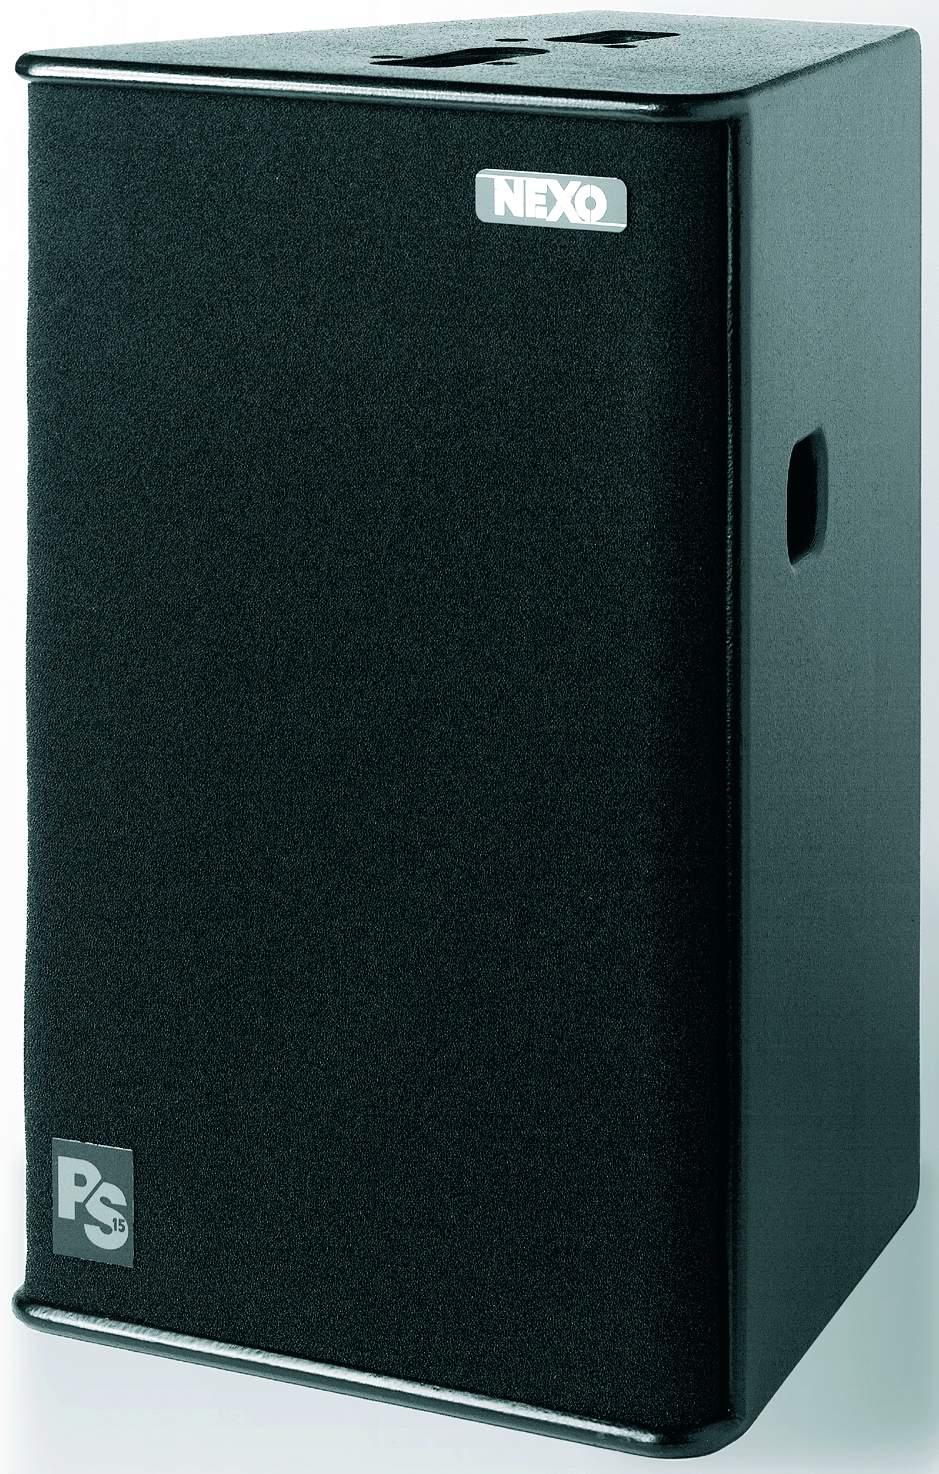 Nexo PS15 Loudspeaker